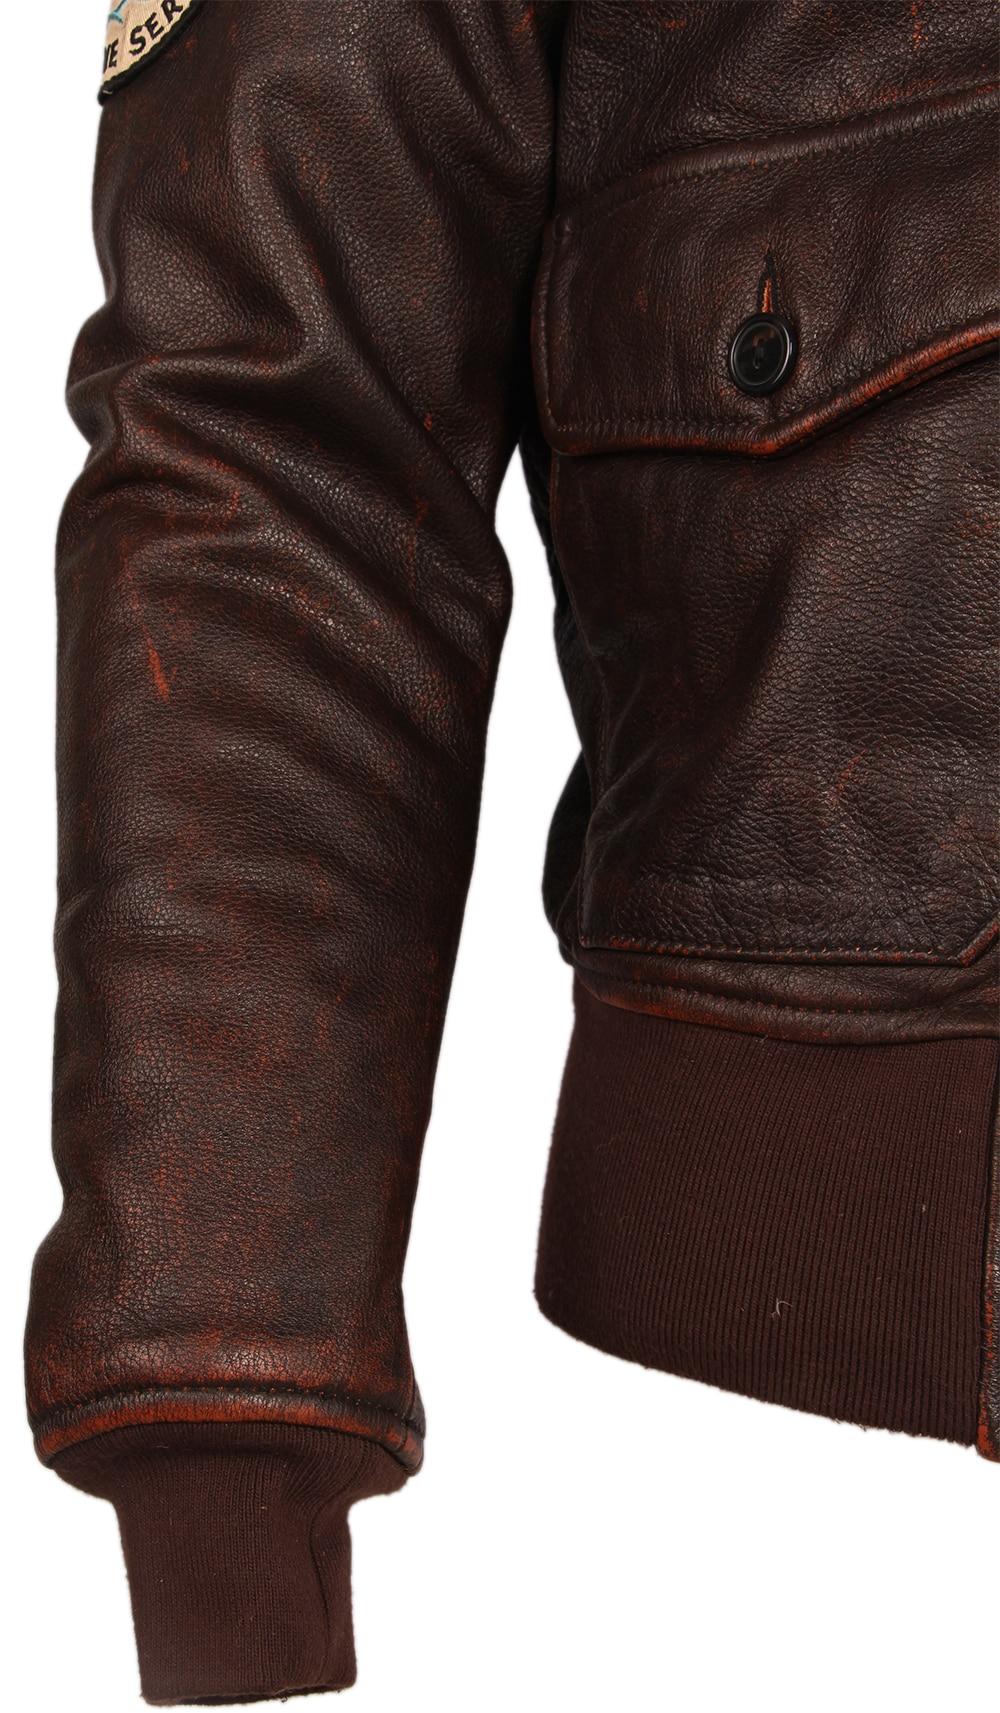 H49106c5b28544ca28fa522eb426fd25db Vintage Distressed Men Leather Jacket Quilted Fur Collar 100% Calfskin Flight Jacket Men's Leather Jacket Man Winter Coat M253